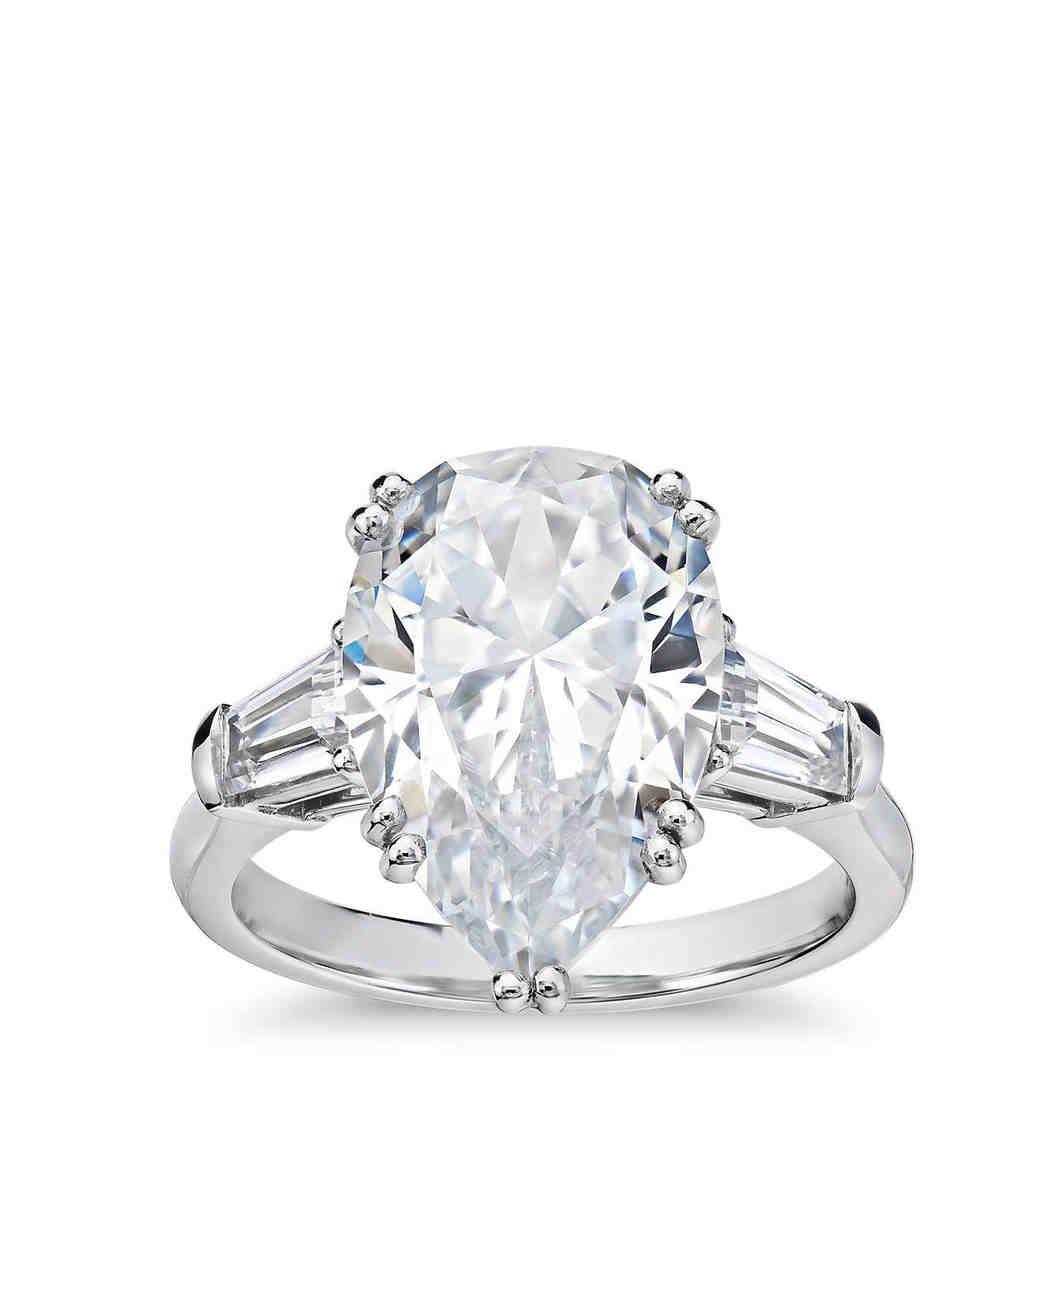 Blue Nile Engagement Ring